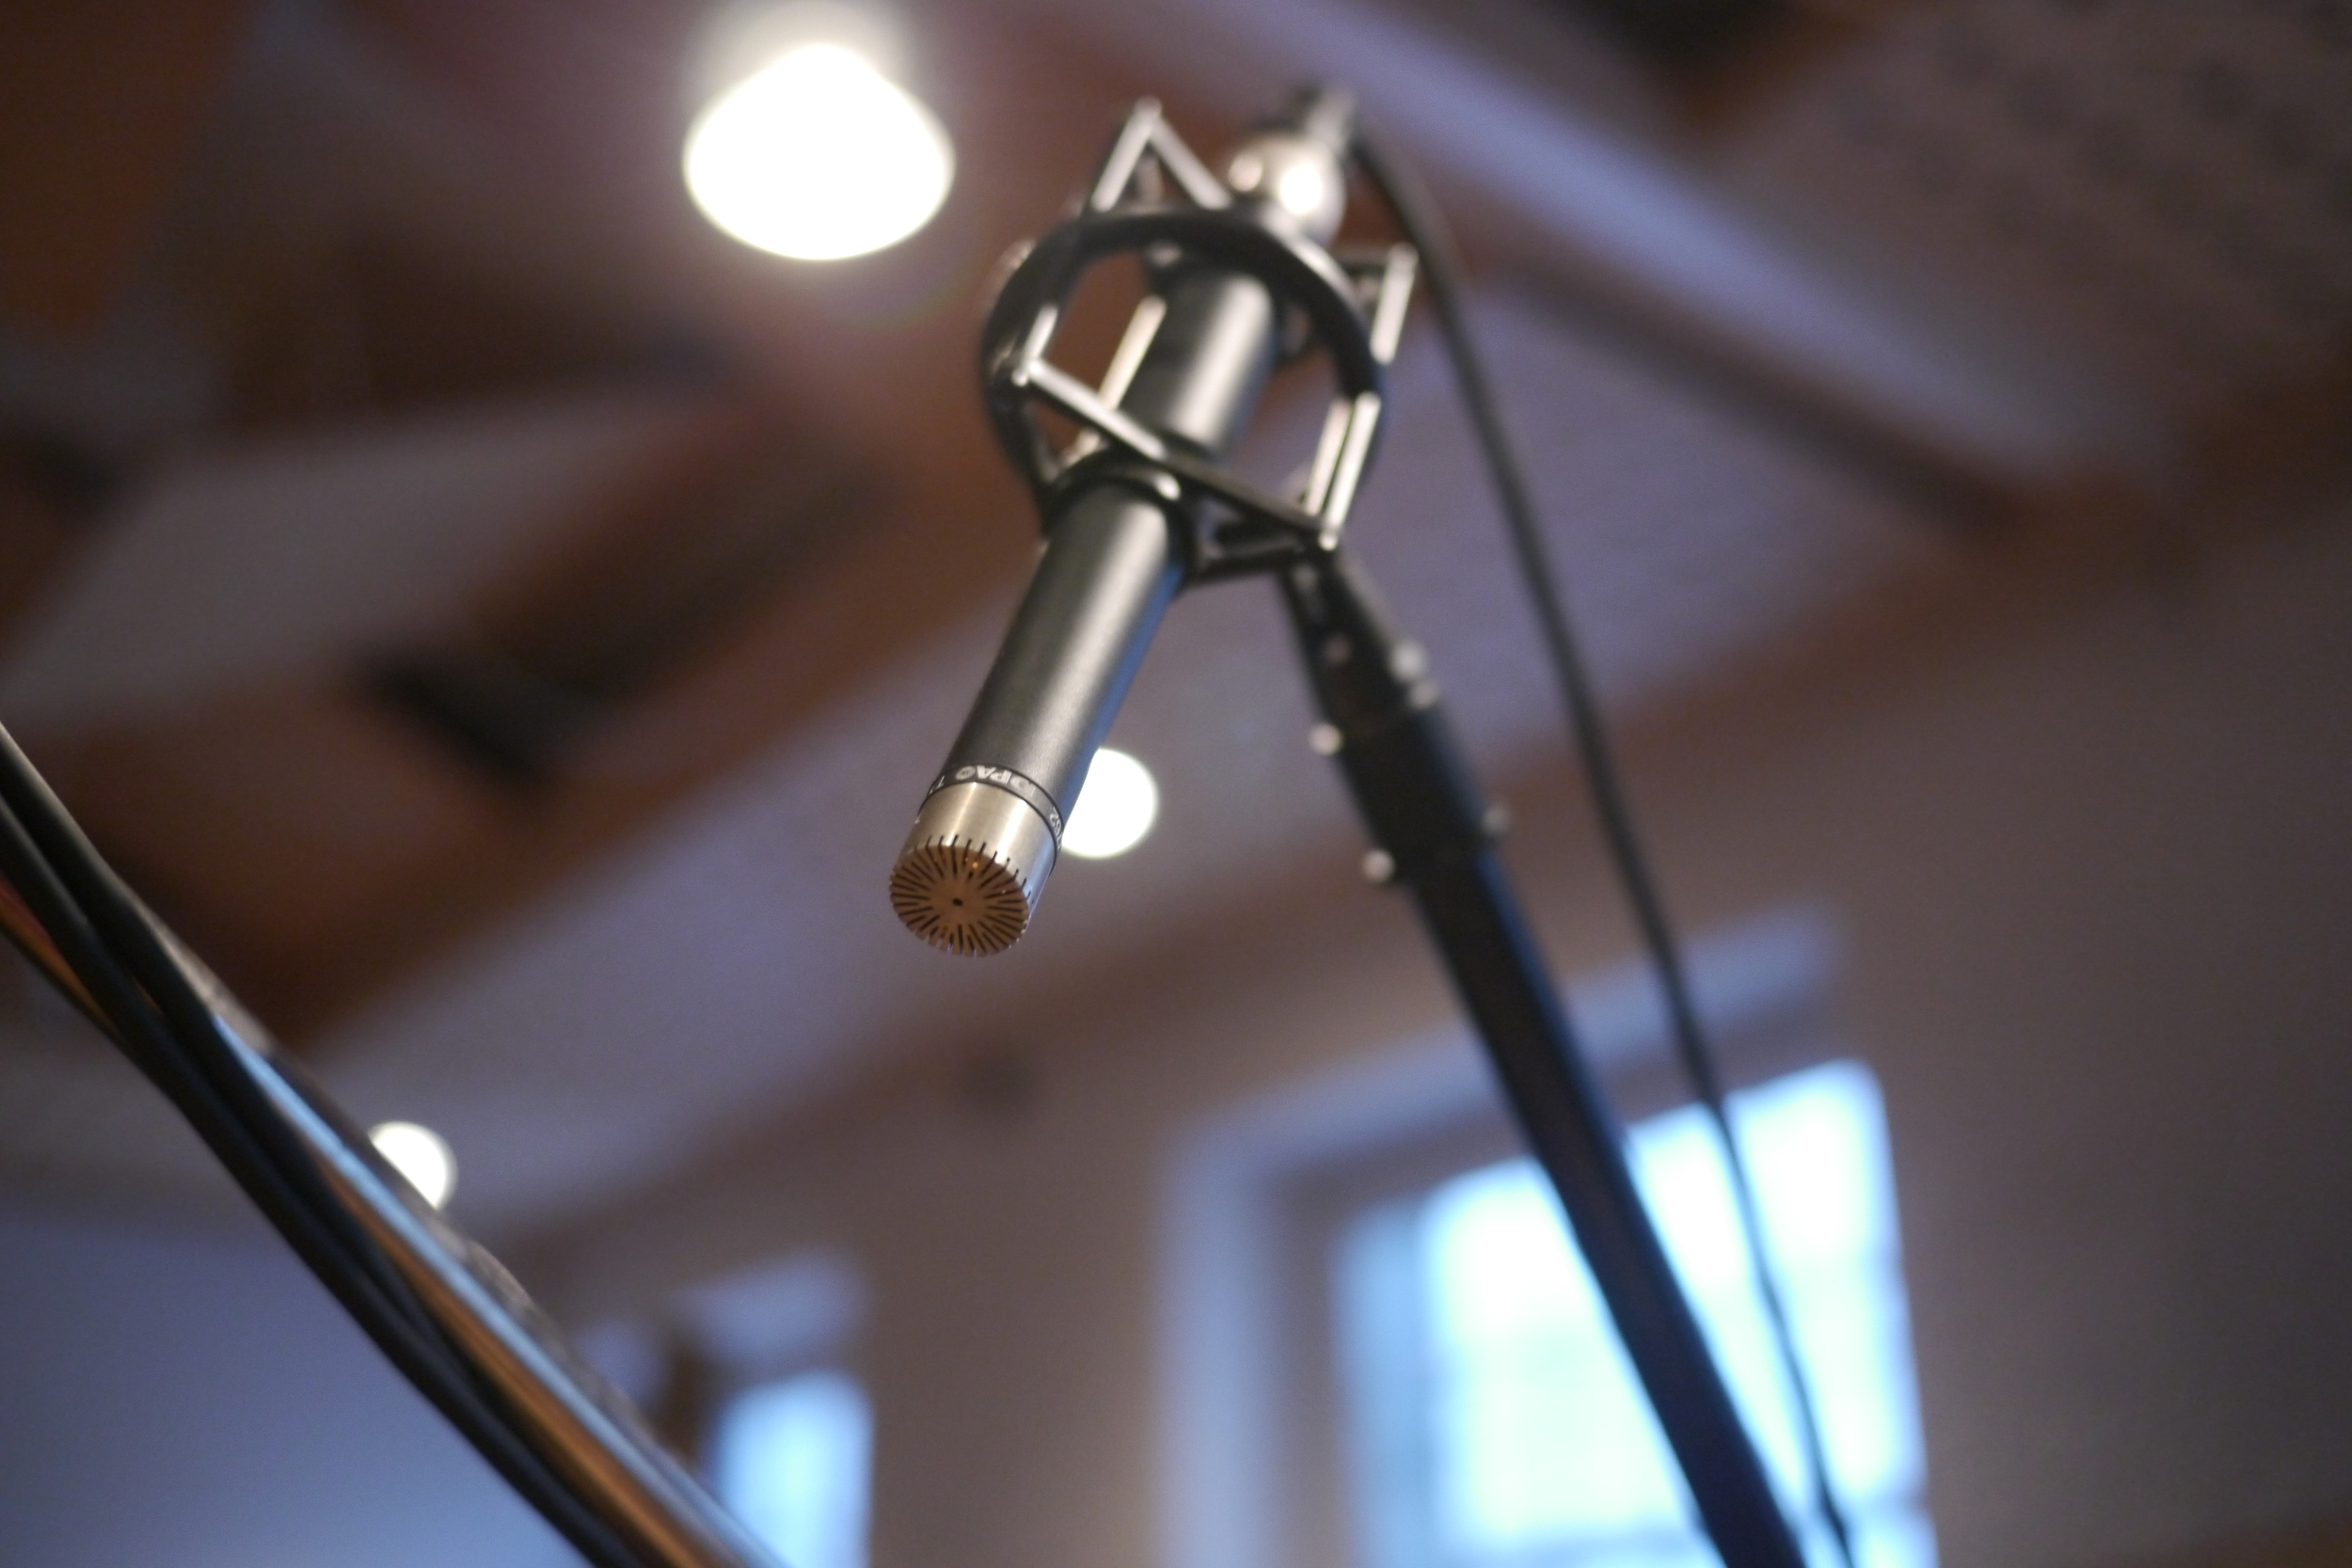 Microphones used:  DPA 4006 AB pair, Schoeps MK4 XY pair, Neumann KM130, AKG C451B